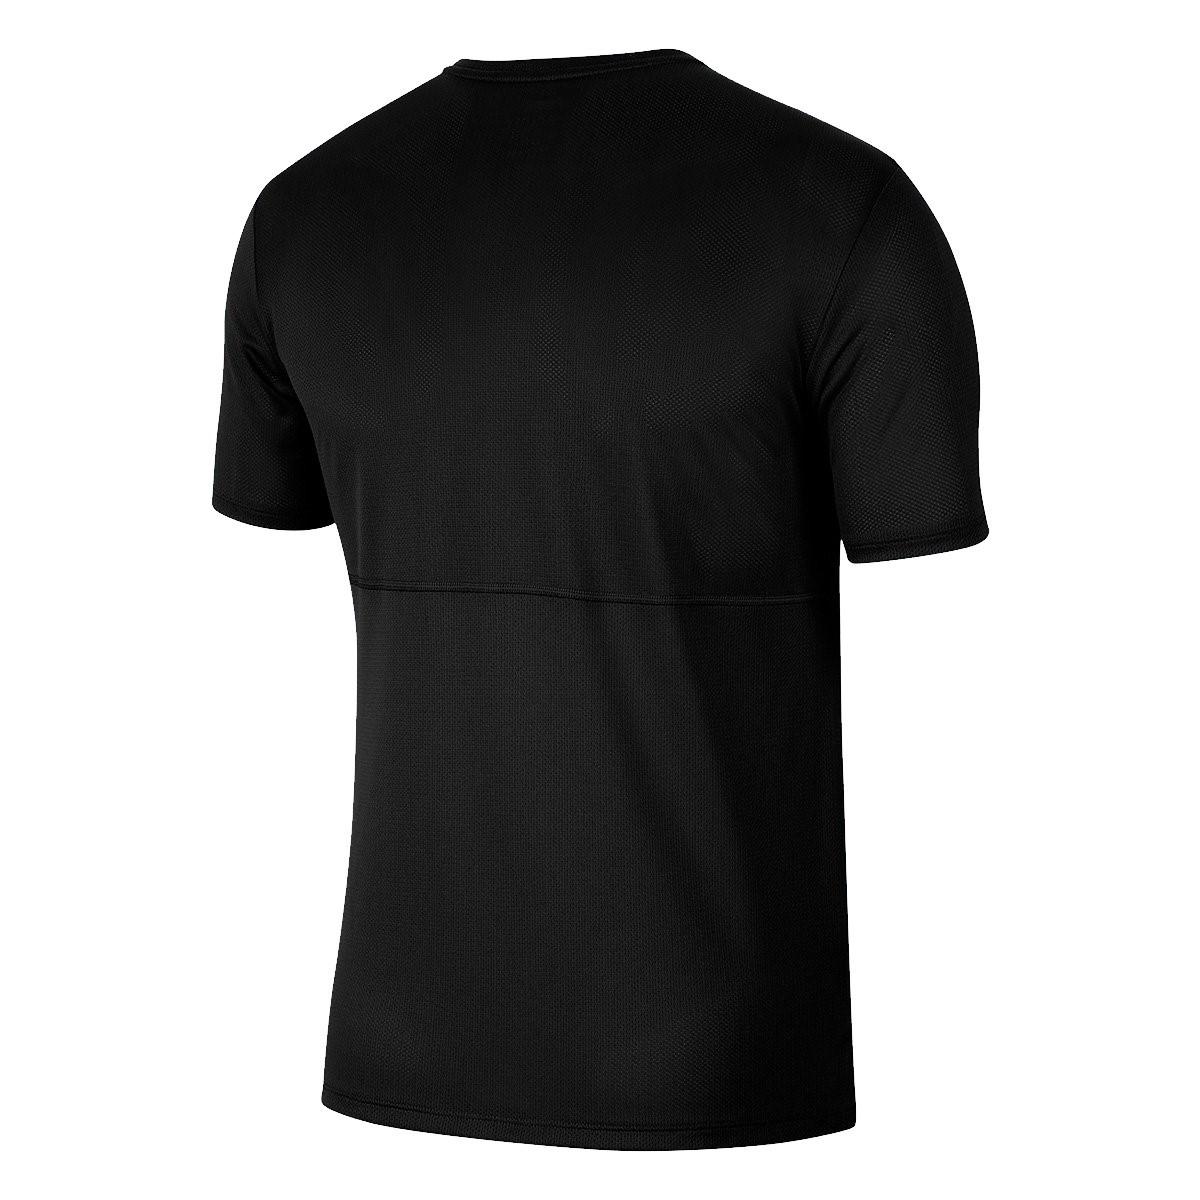 Camiseta Nike Dri Fit Breathe Run Top SS Preto - Masculino